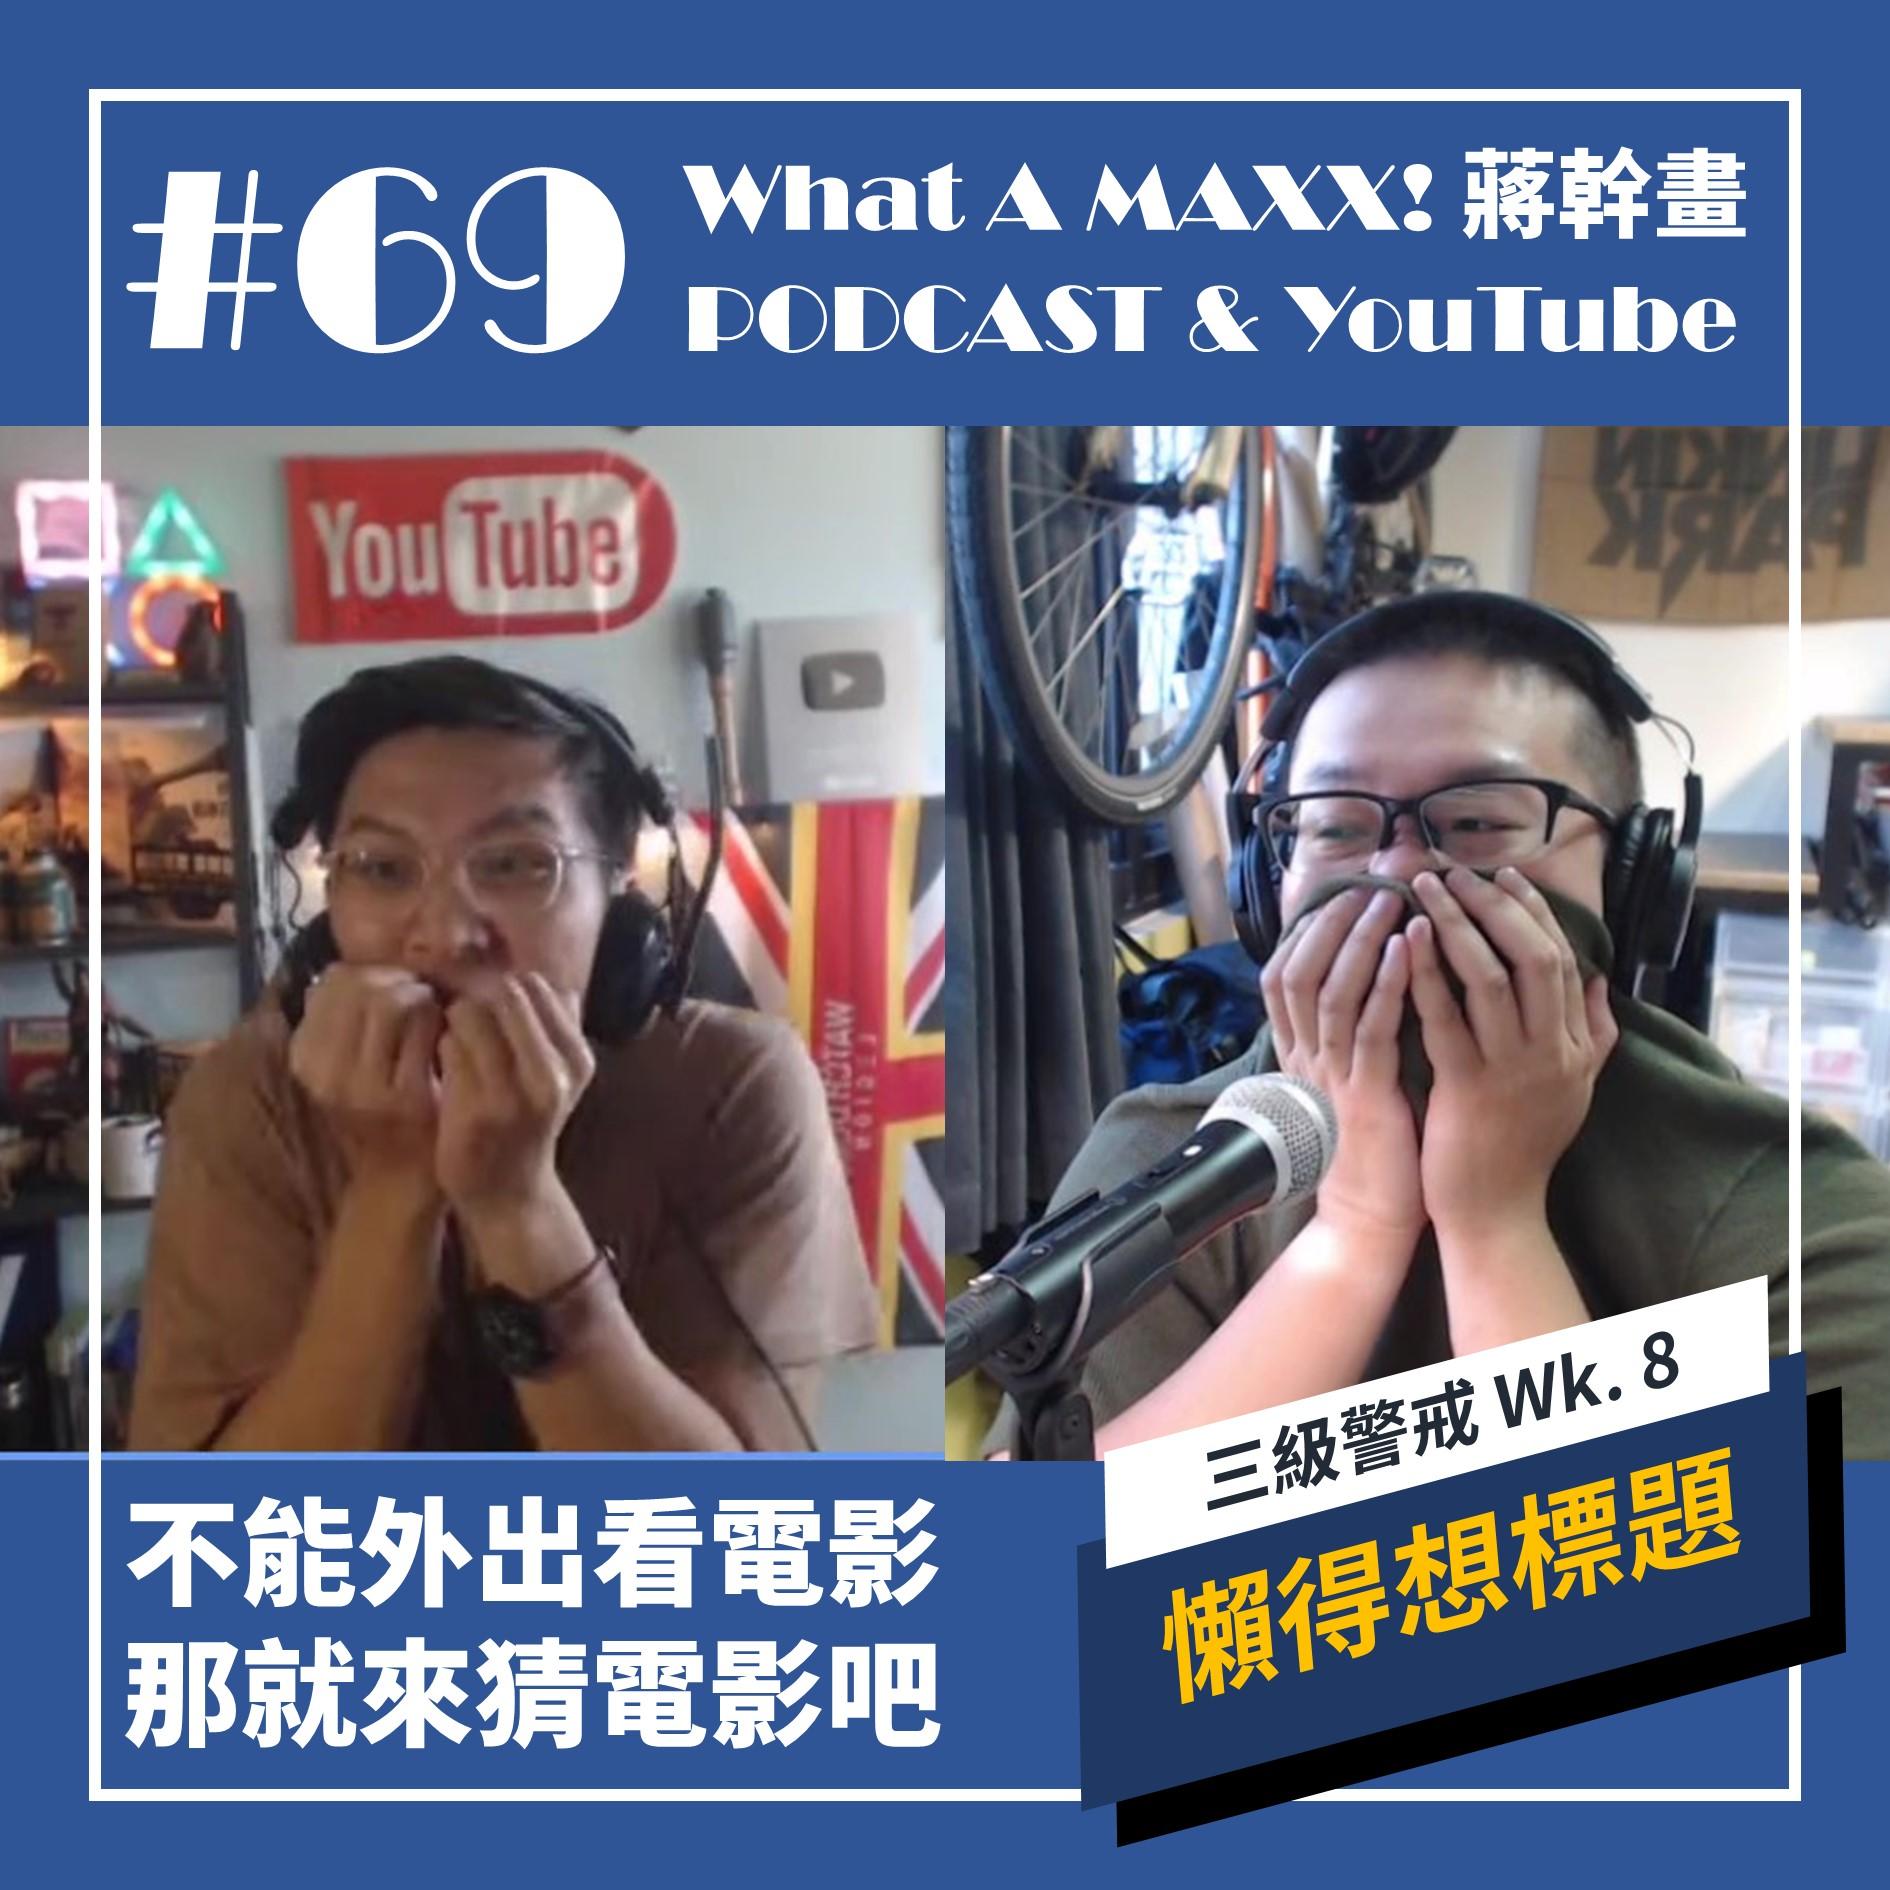 【What A MAXX! 蔣幹畫...懶得想標題... 】#069 - 沒辦法出門看電影,那就來猜電影吧 | XXY + MATT